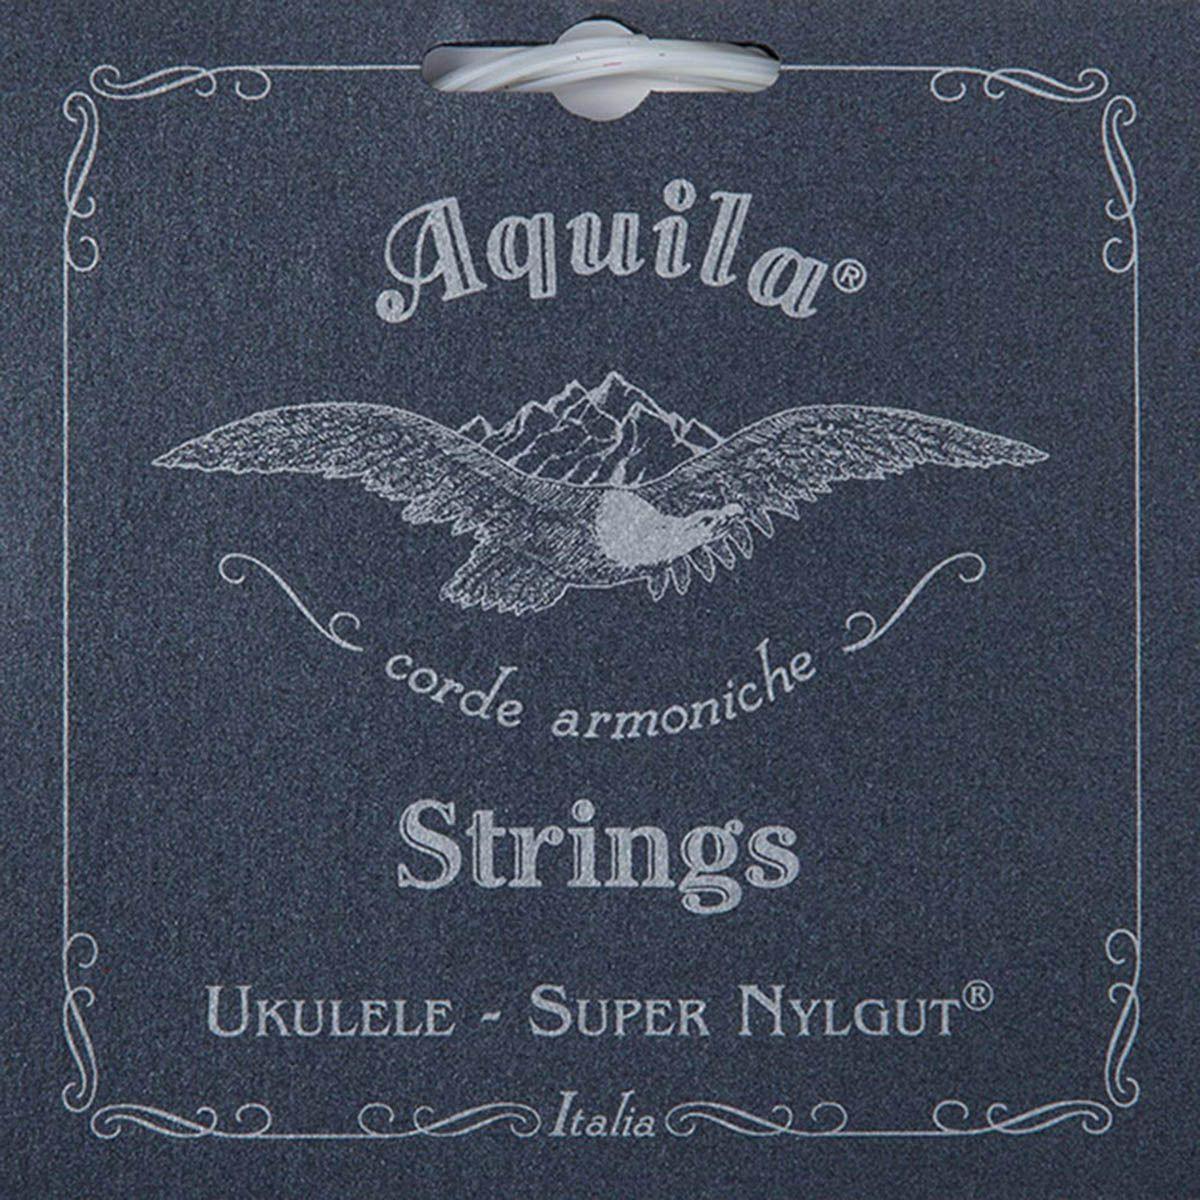 Encordoamento Aquila 100u Super Nylgut High G Soprano